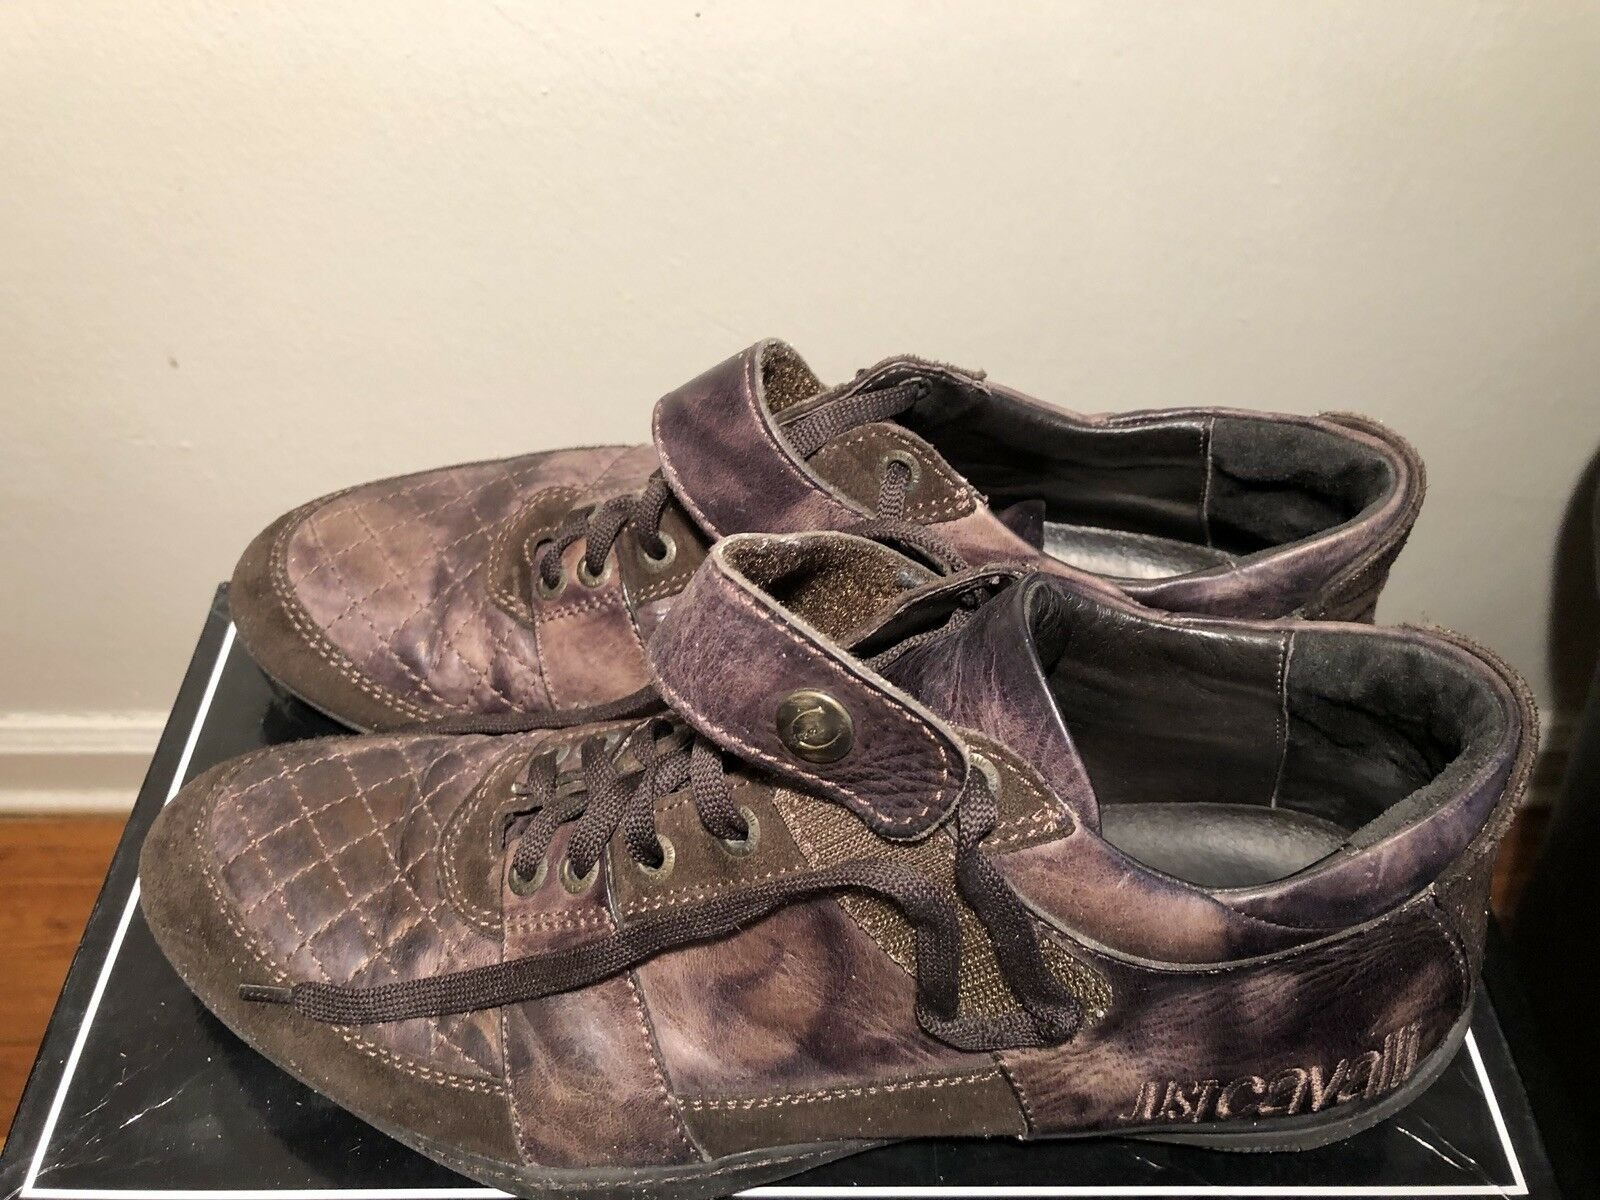 Just cavalli Uomo brown shoes size 10 us us us d72d1e